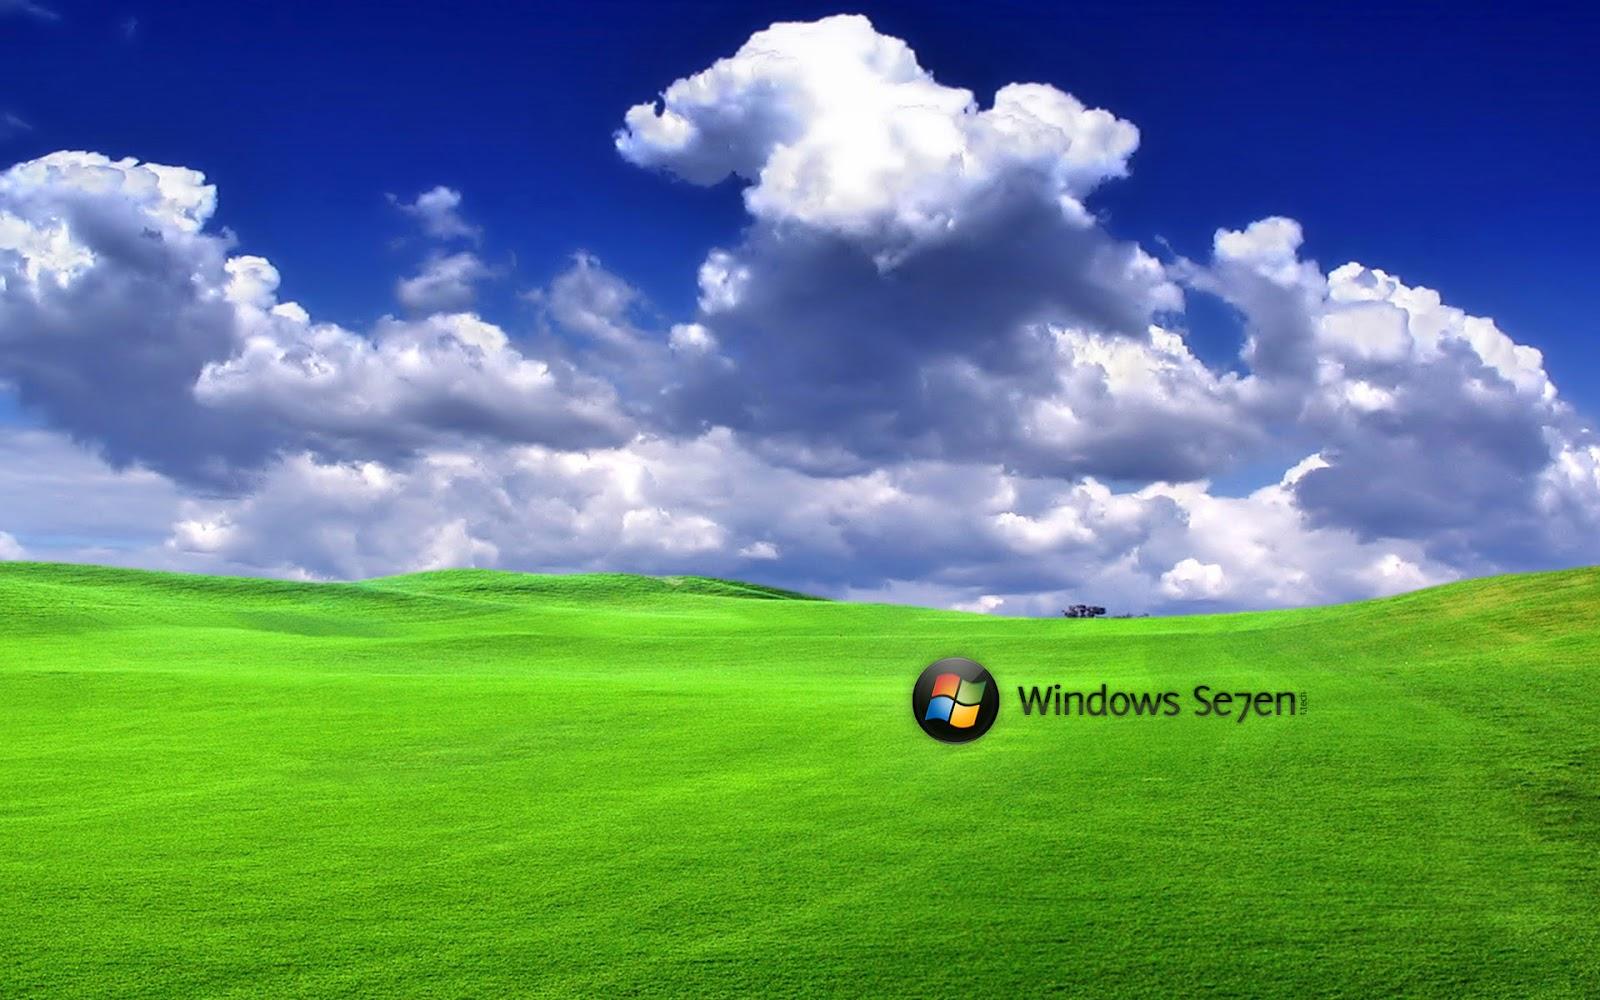 Animated Wallpaper Windows 7 64 Jessica Alba Hd Iphone Wallpaper 1600x1000